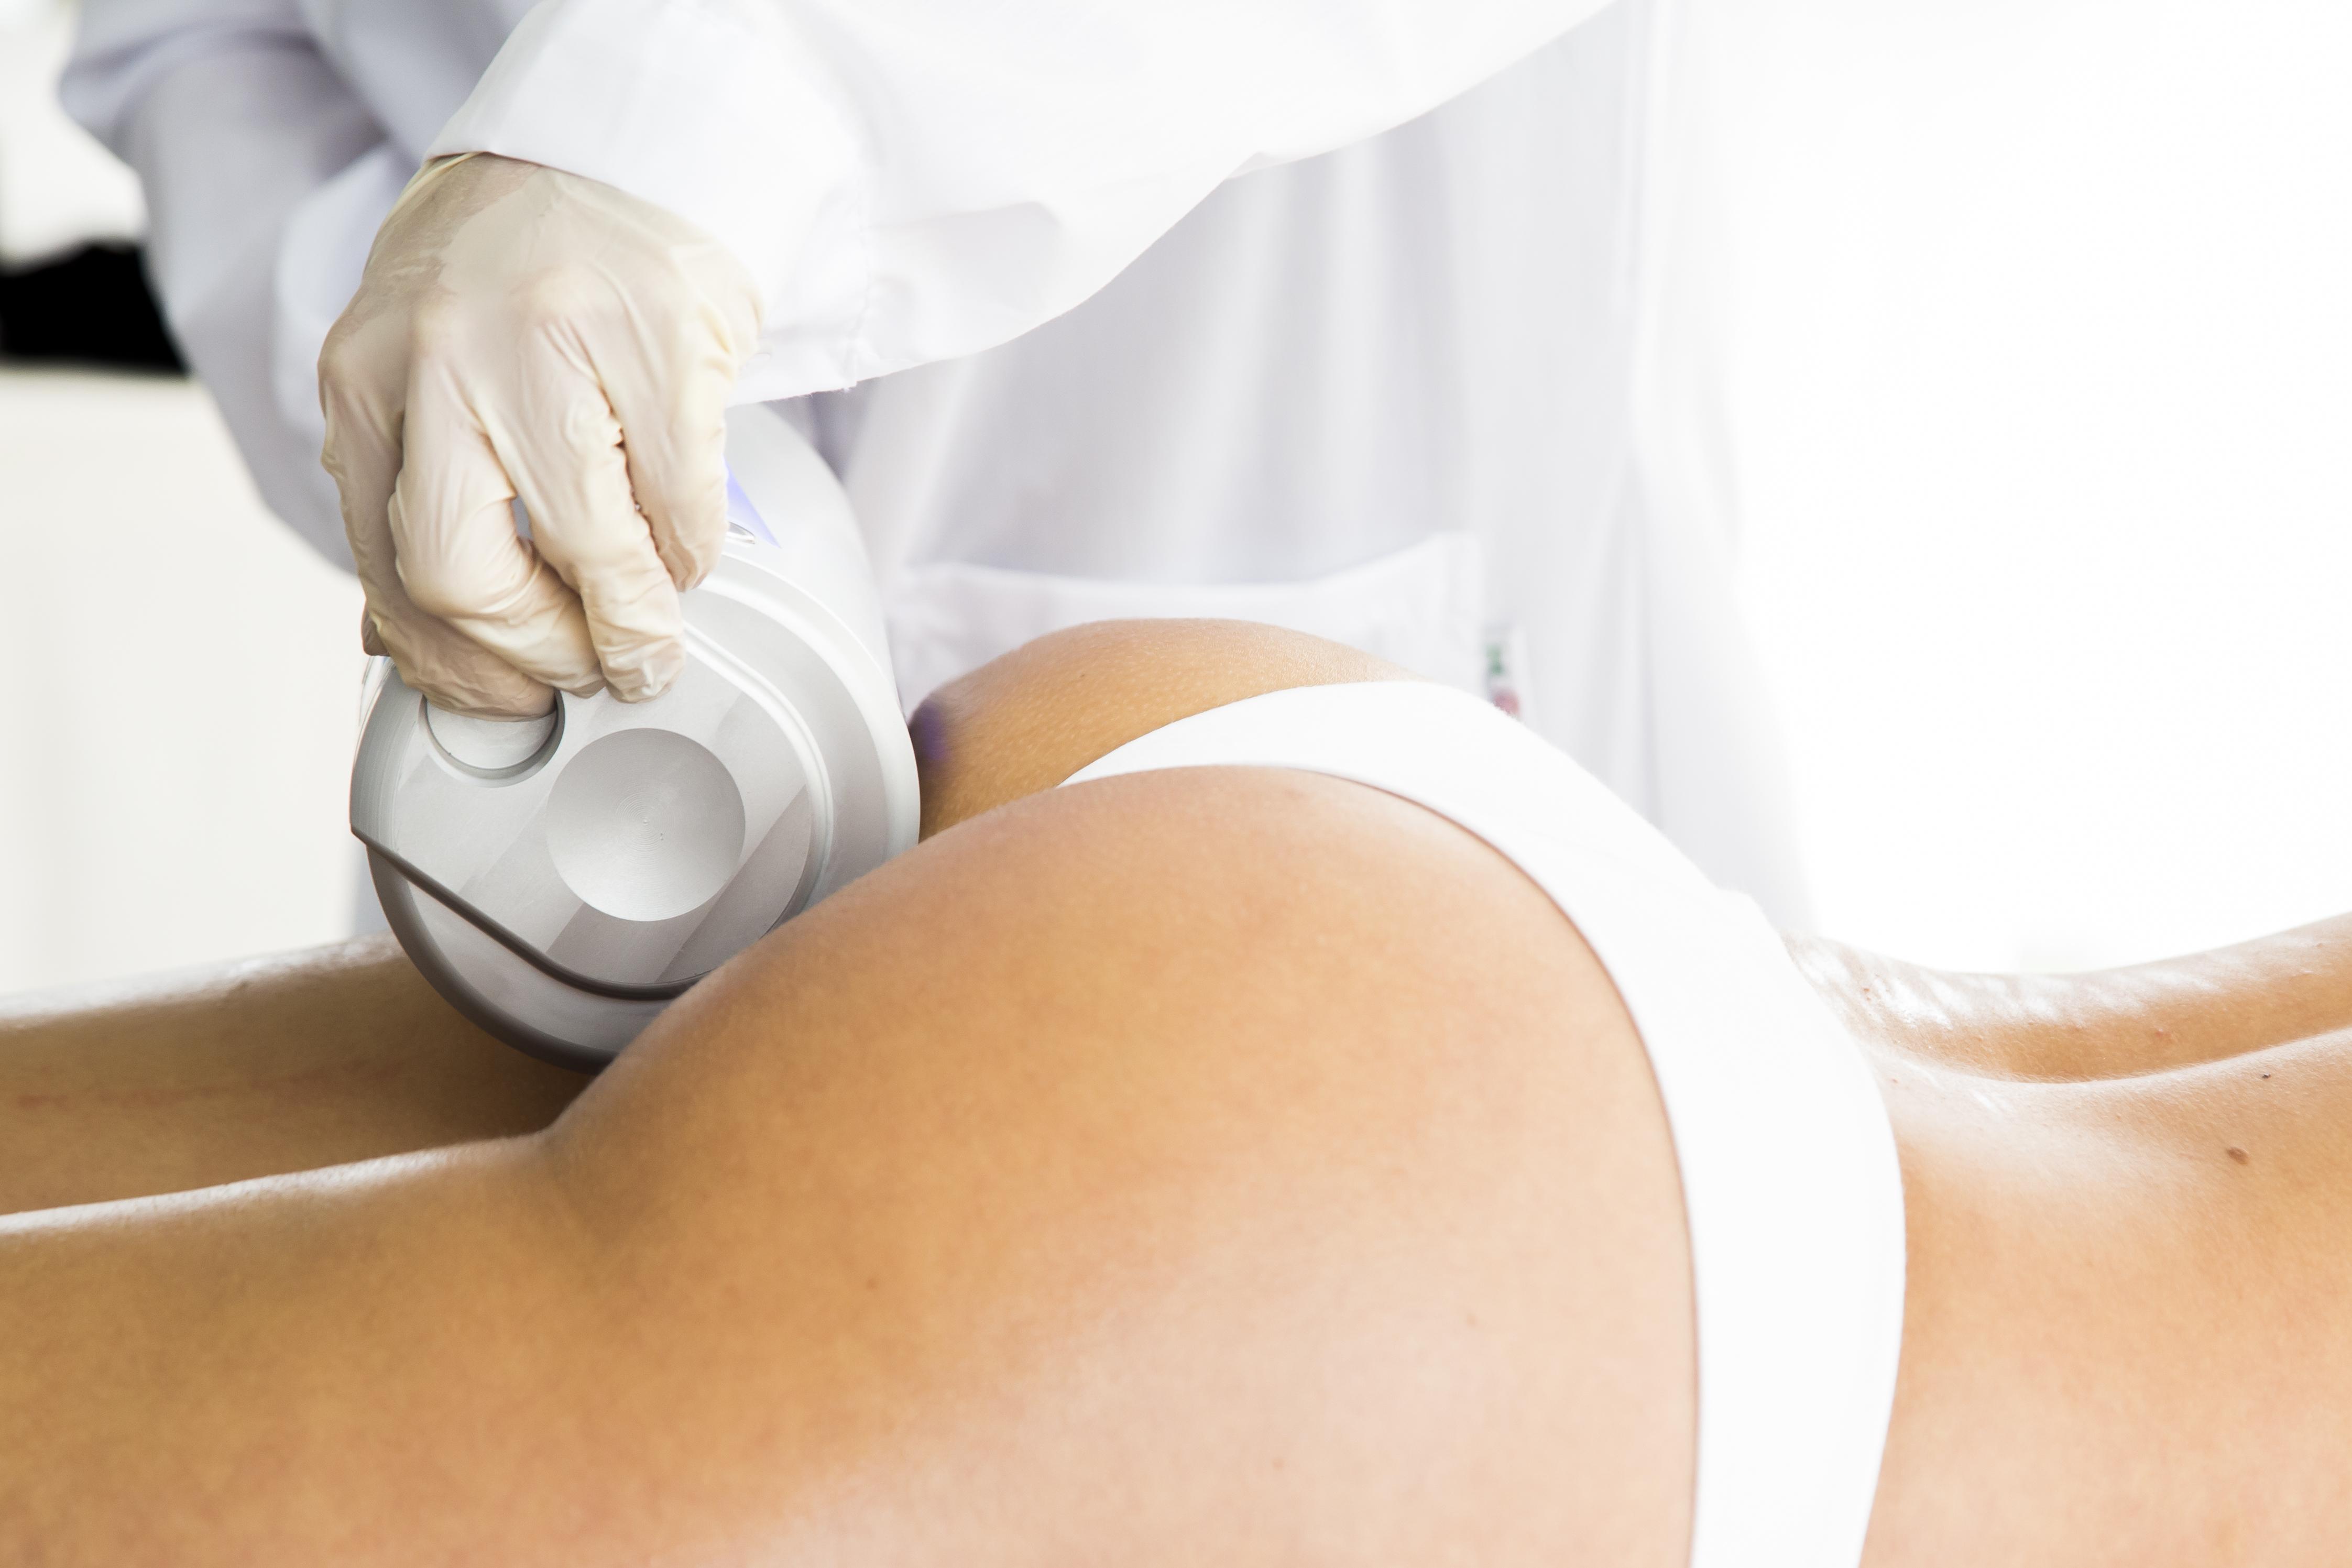 Sproščujoča anticelulitna masaža